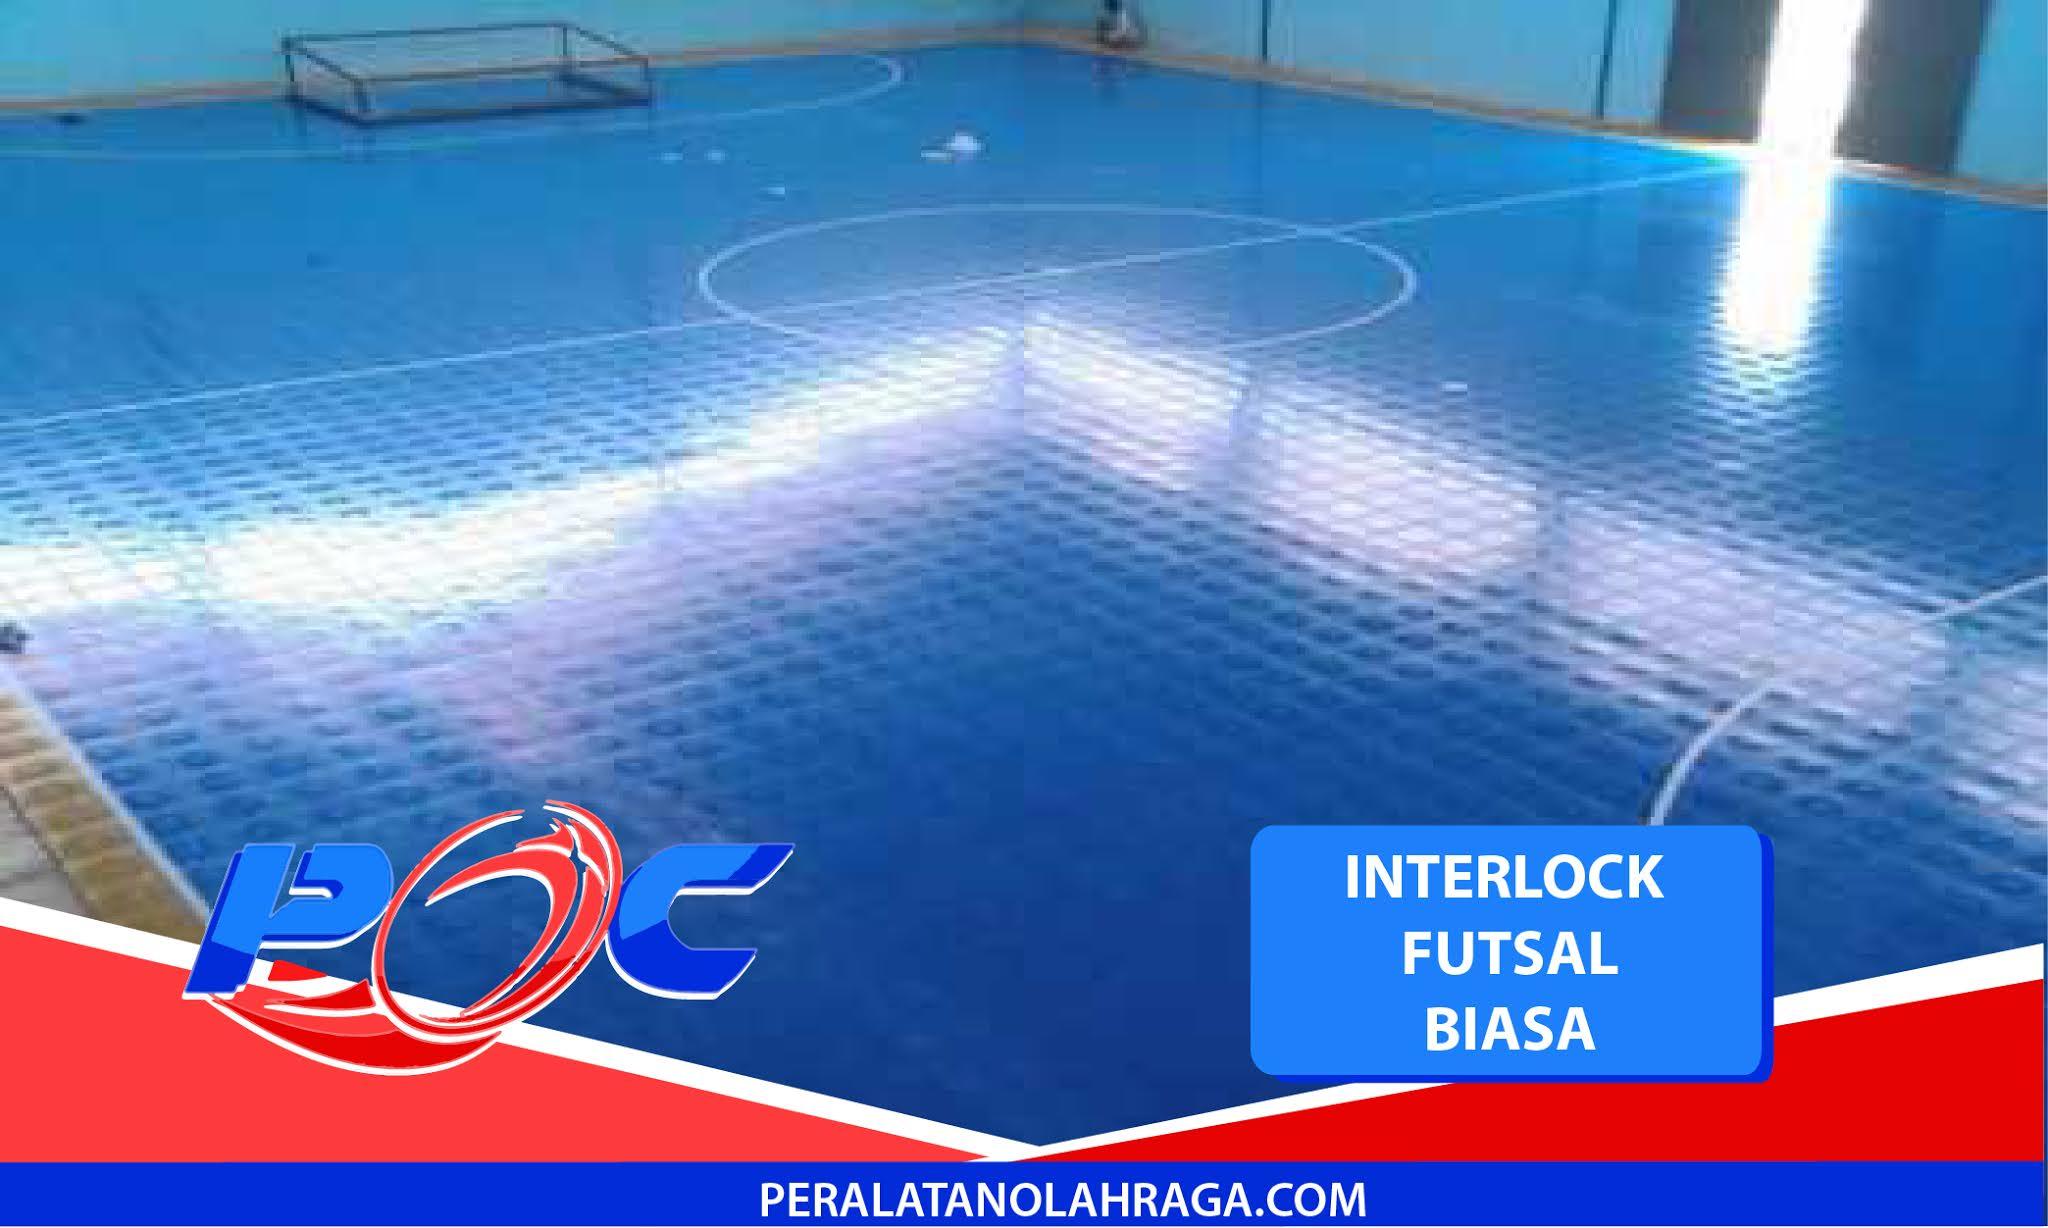 Interlock Futsal Biasa